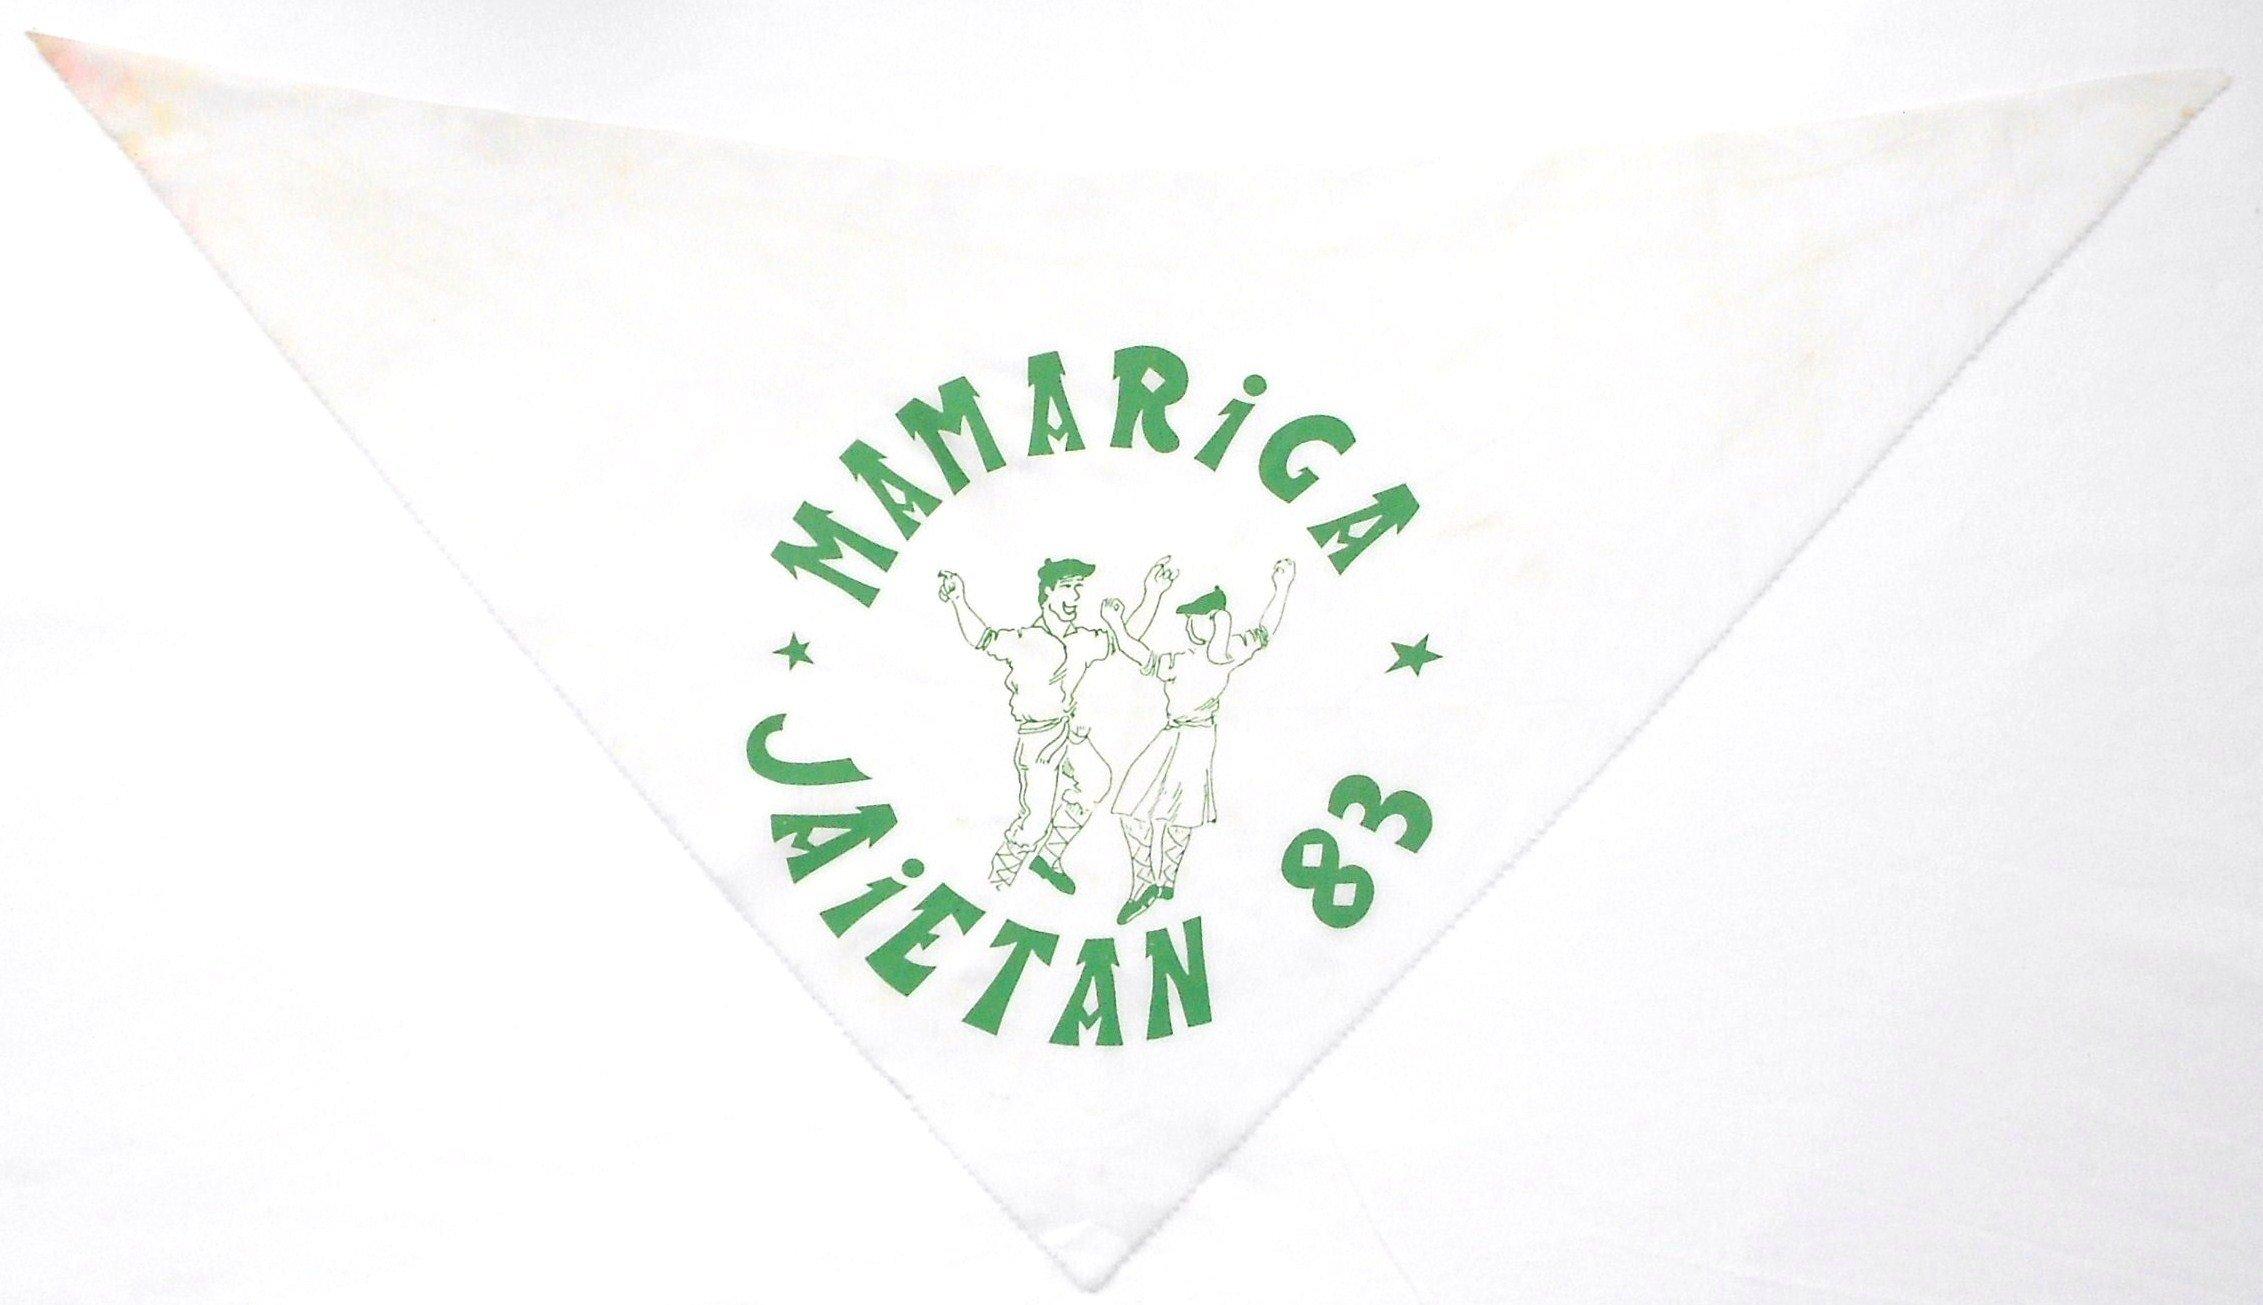 Pañuelo 1983